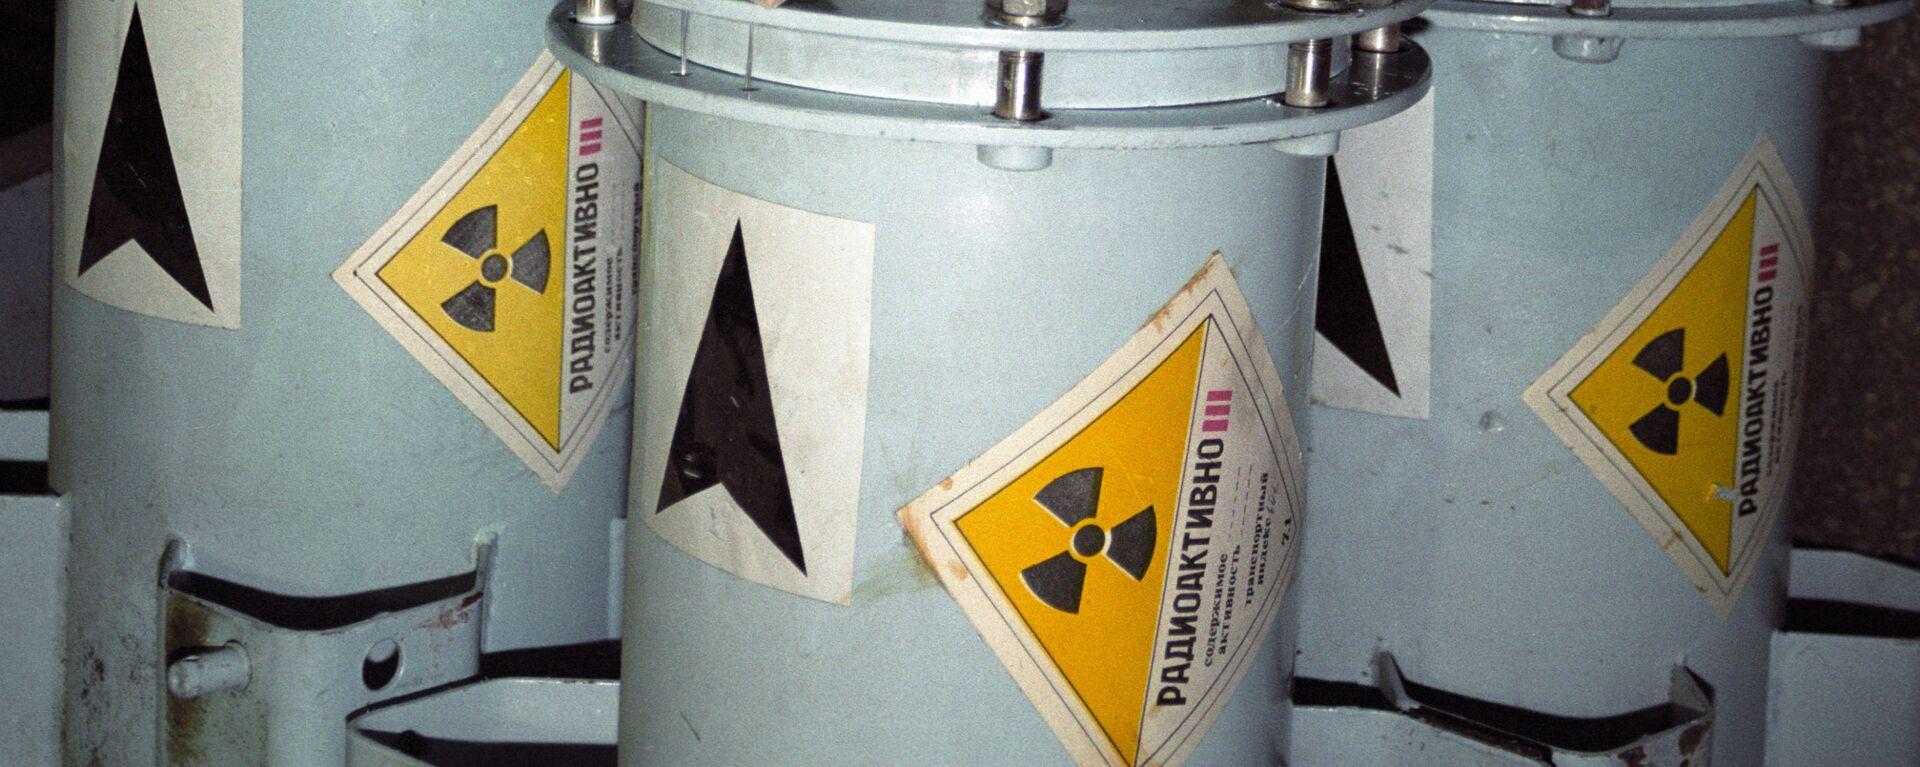 Ядерное топливо - Sputnik Латвия, 1920, 12.07.2021